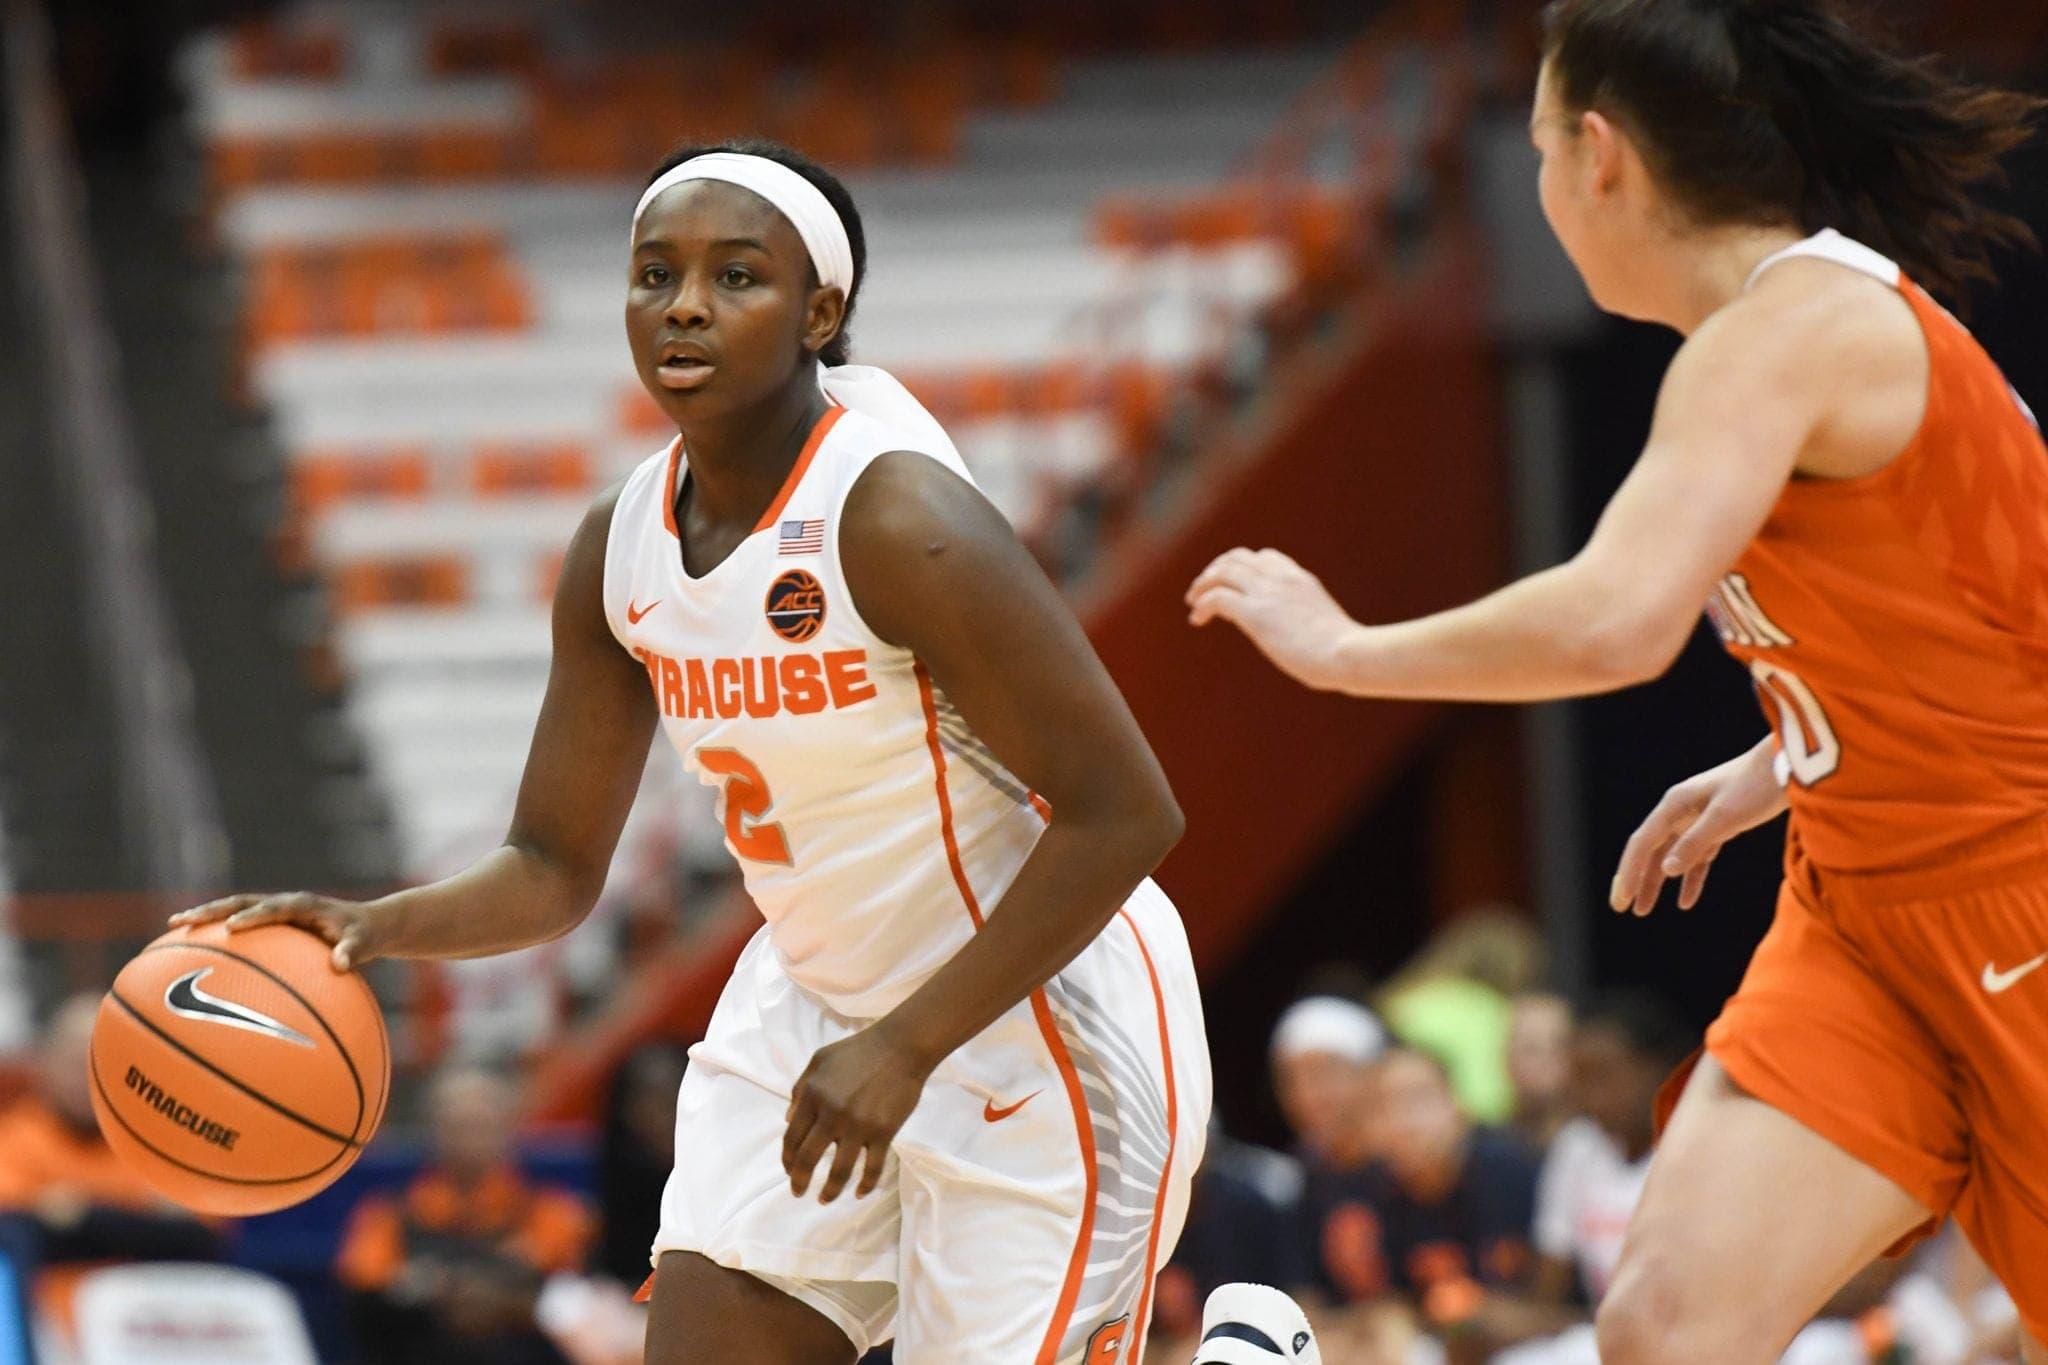 Women's basketball versus Clemson